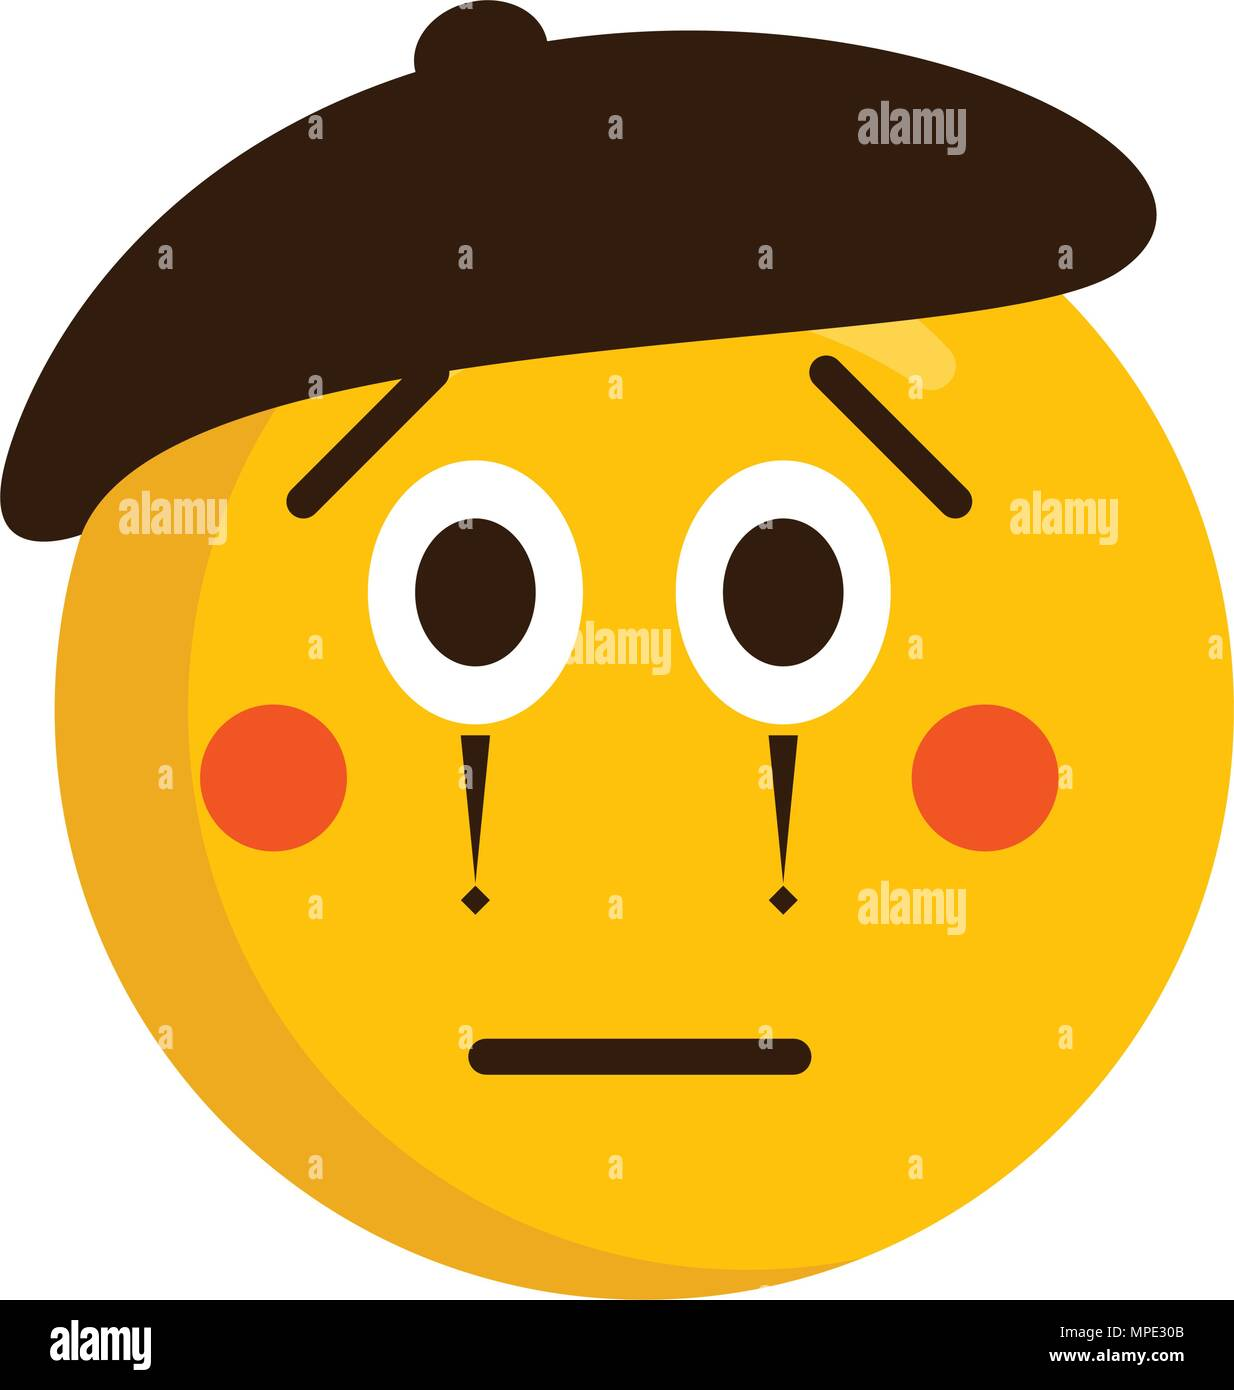 Sad mime emoji icon - Stock Vector